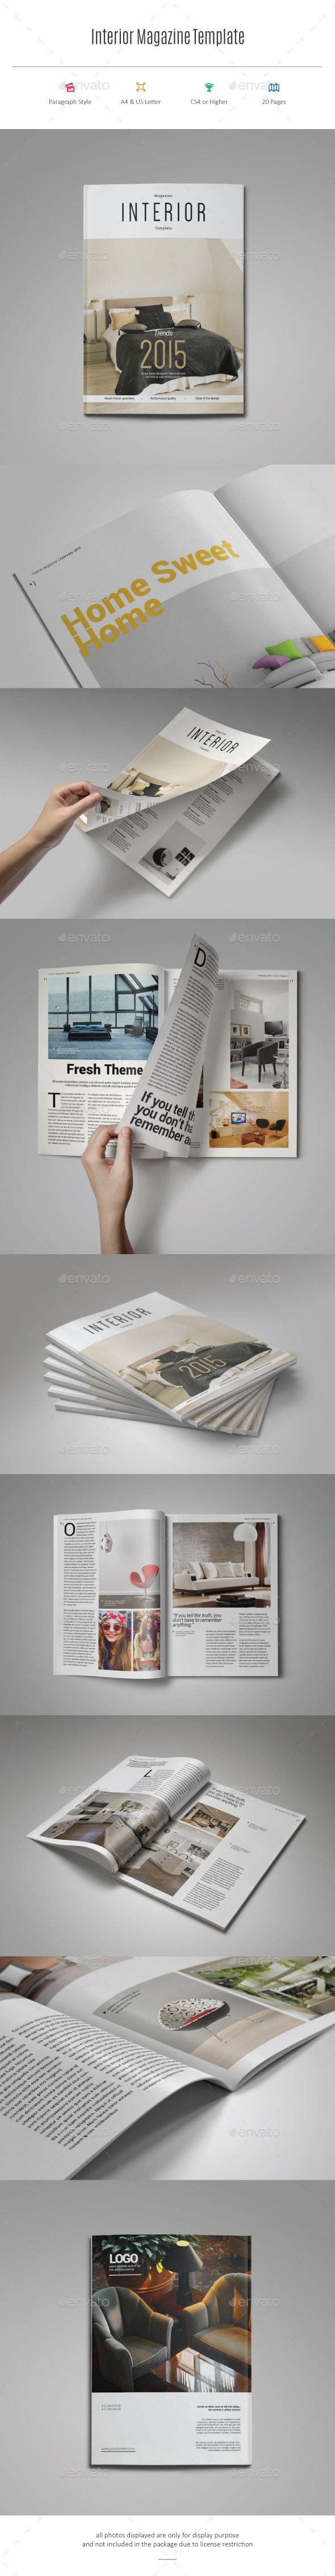 Interior Magazine Template #design #journal Download: http://graphicriver.net/item/interior-magazine-template/11421391?ref=ksioks